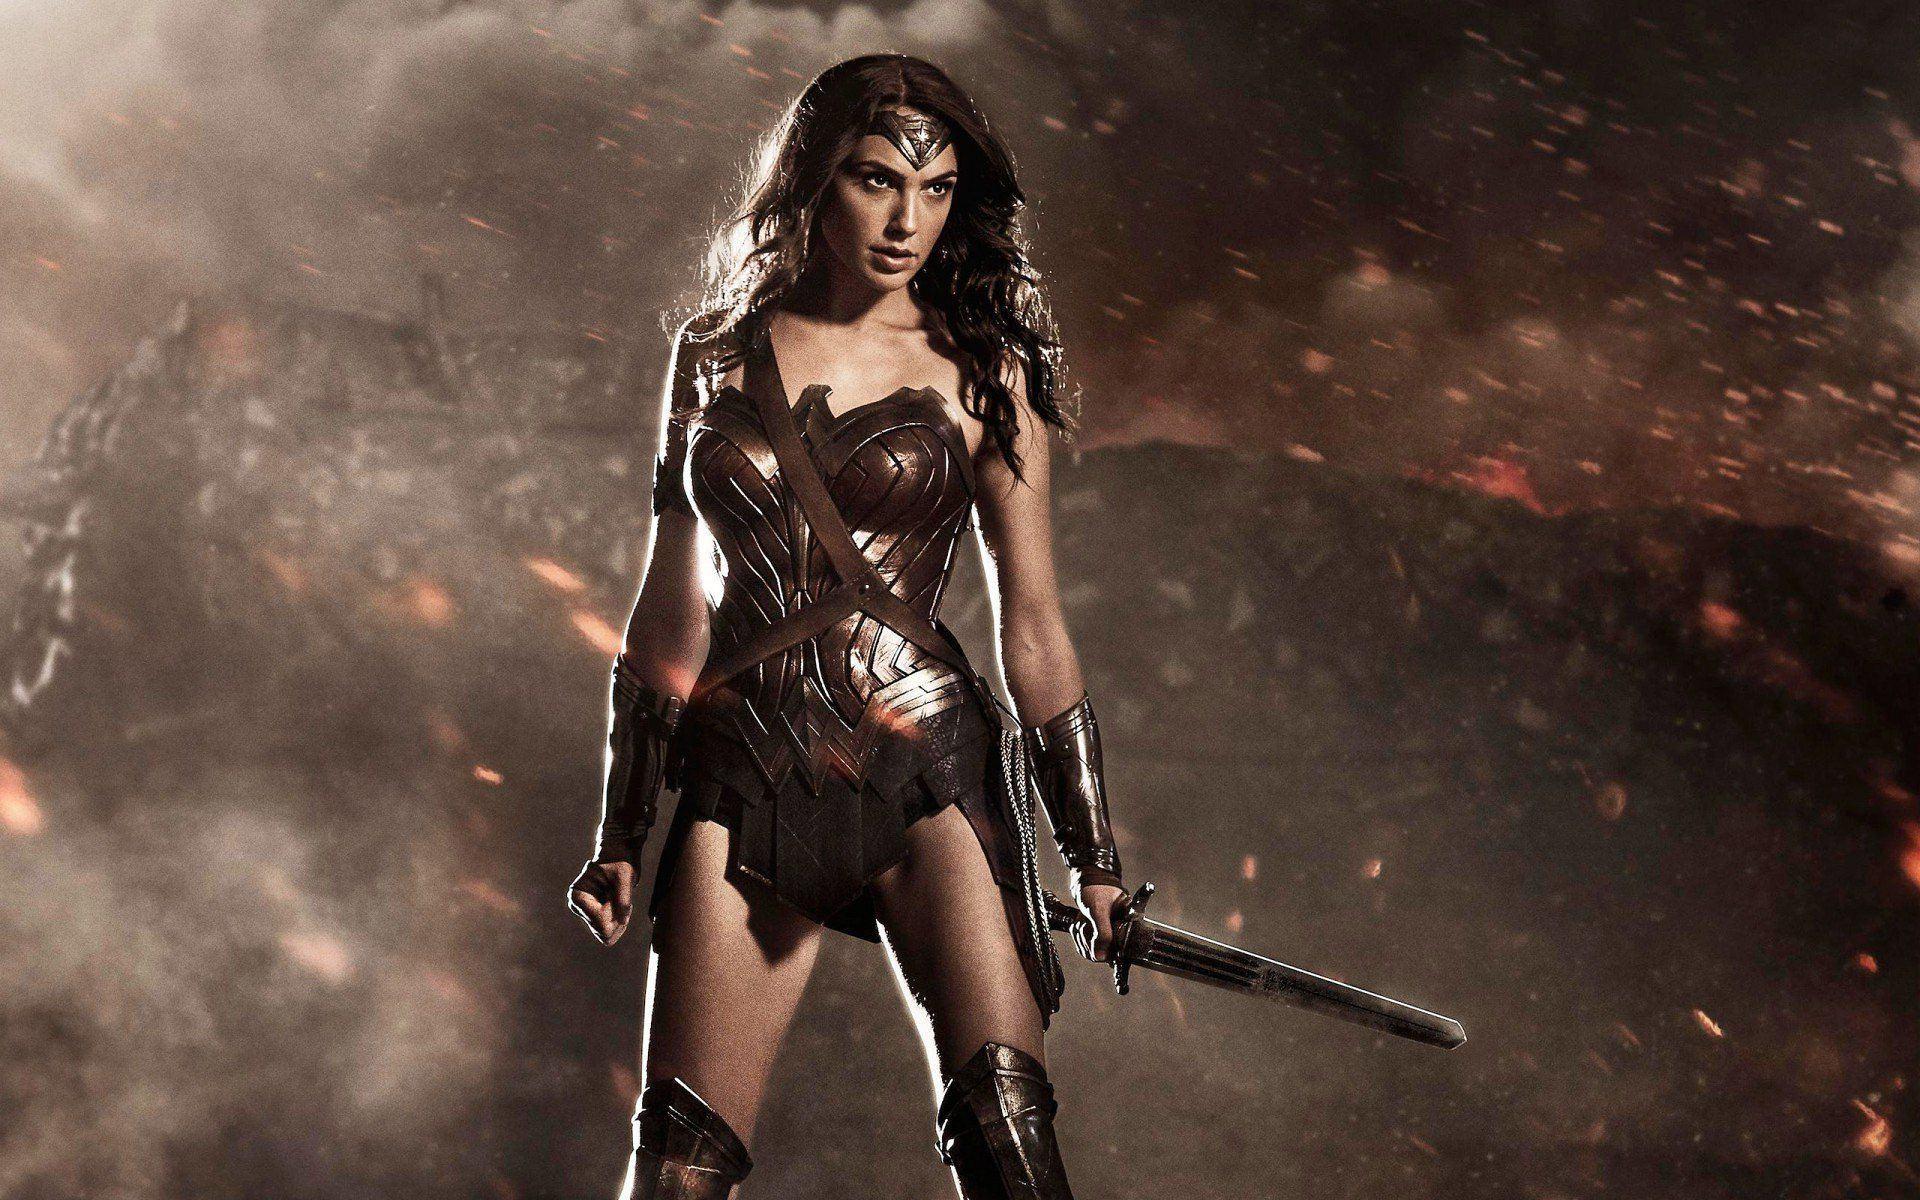 Mulher-Maravilha | Gal Gadot comenta sobre uniforme da protagonista